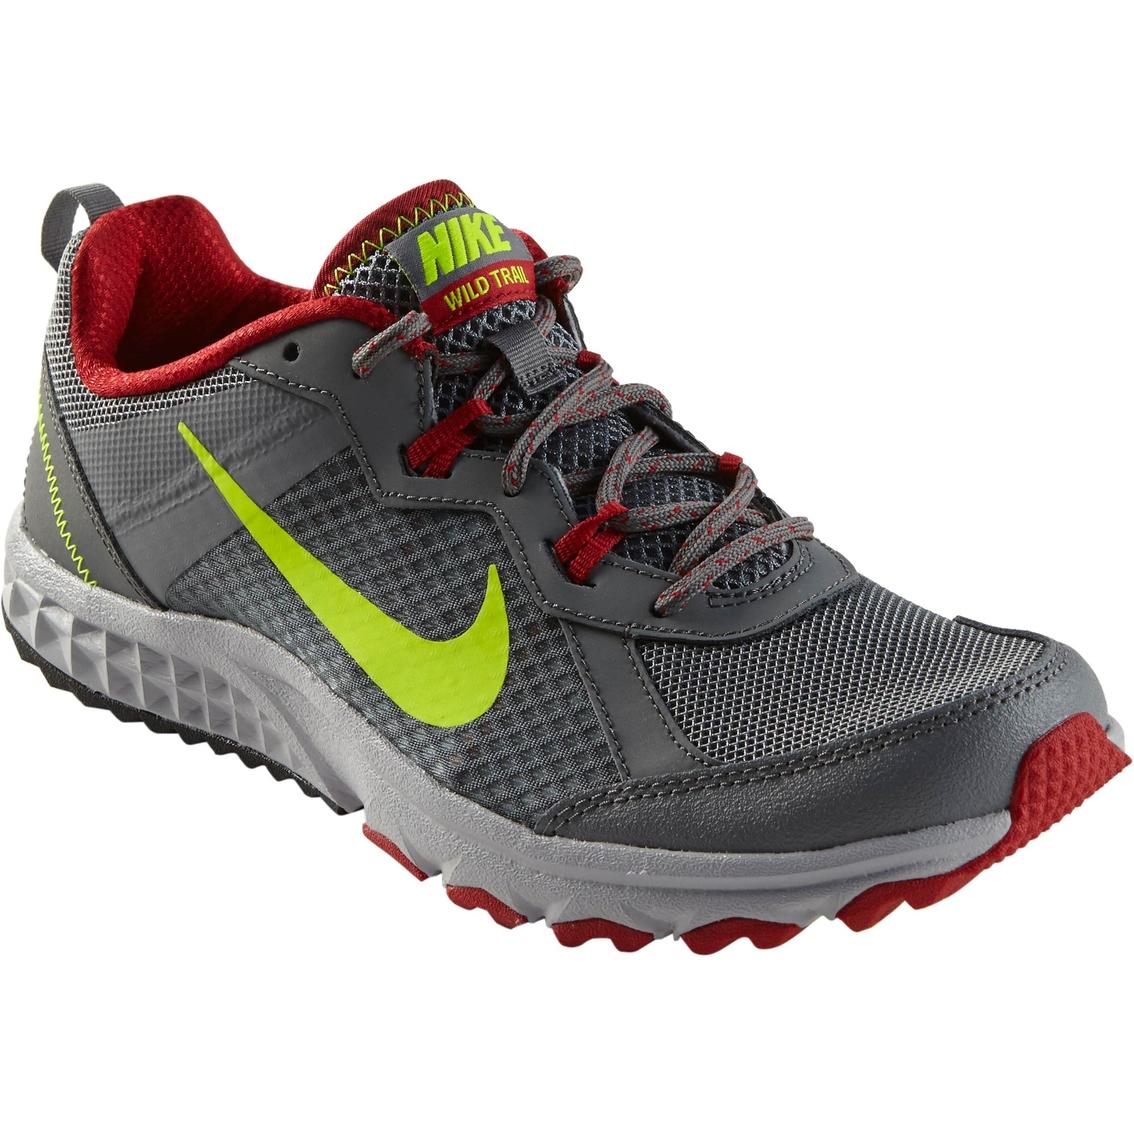 nike trail running shoes fwum UFBRWSQ